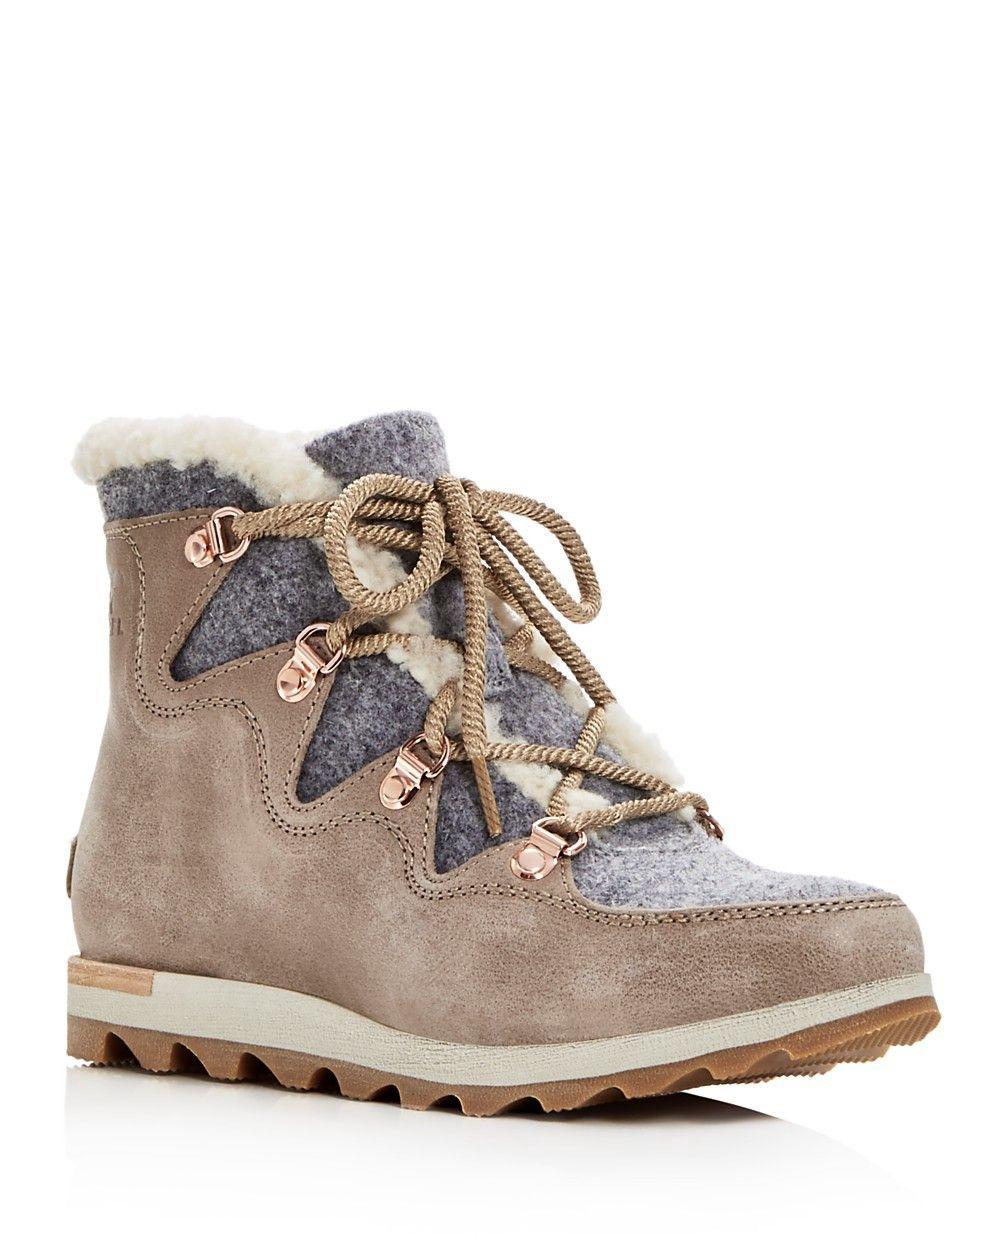 18e92a17760 SOREL Sorel Women's Sneakchic Alpine Shearling & Leather Lace Up Booties. # sorel #shoes #